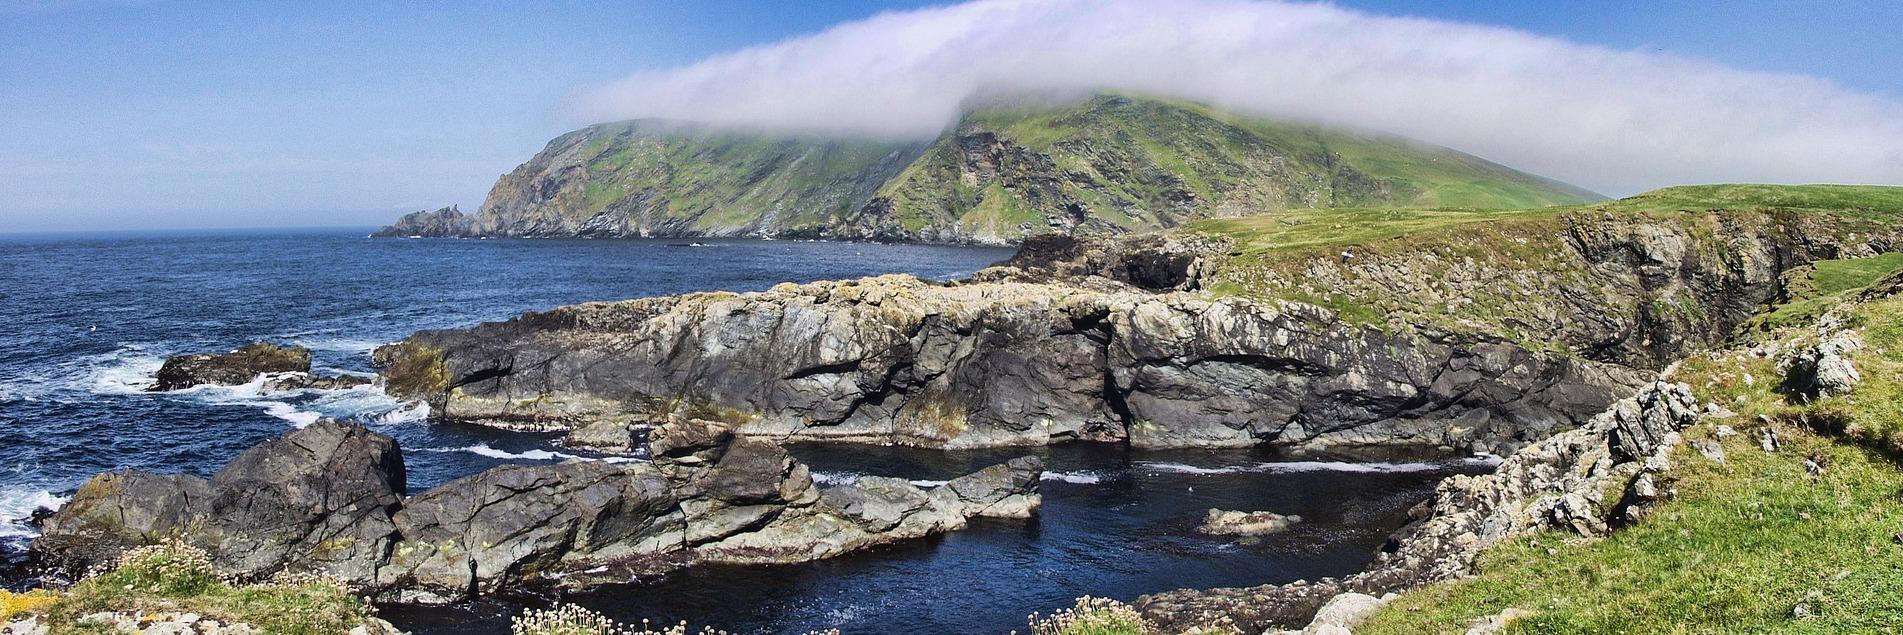 Orkney or Shetlands - Luxury self catering cottages